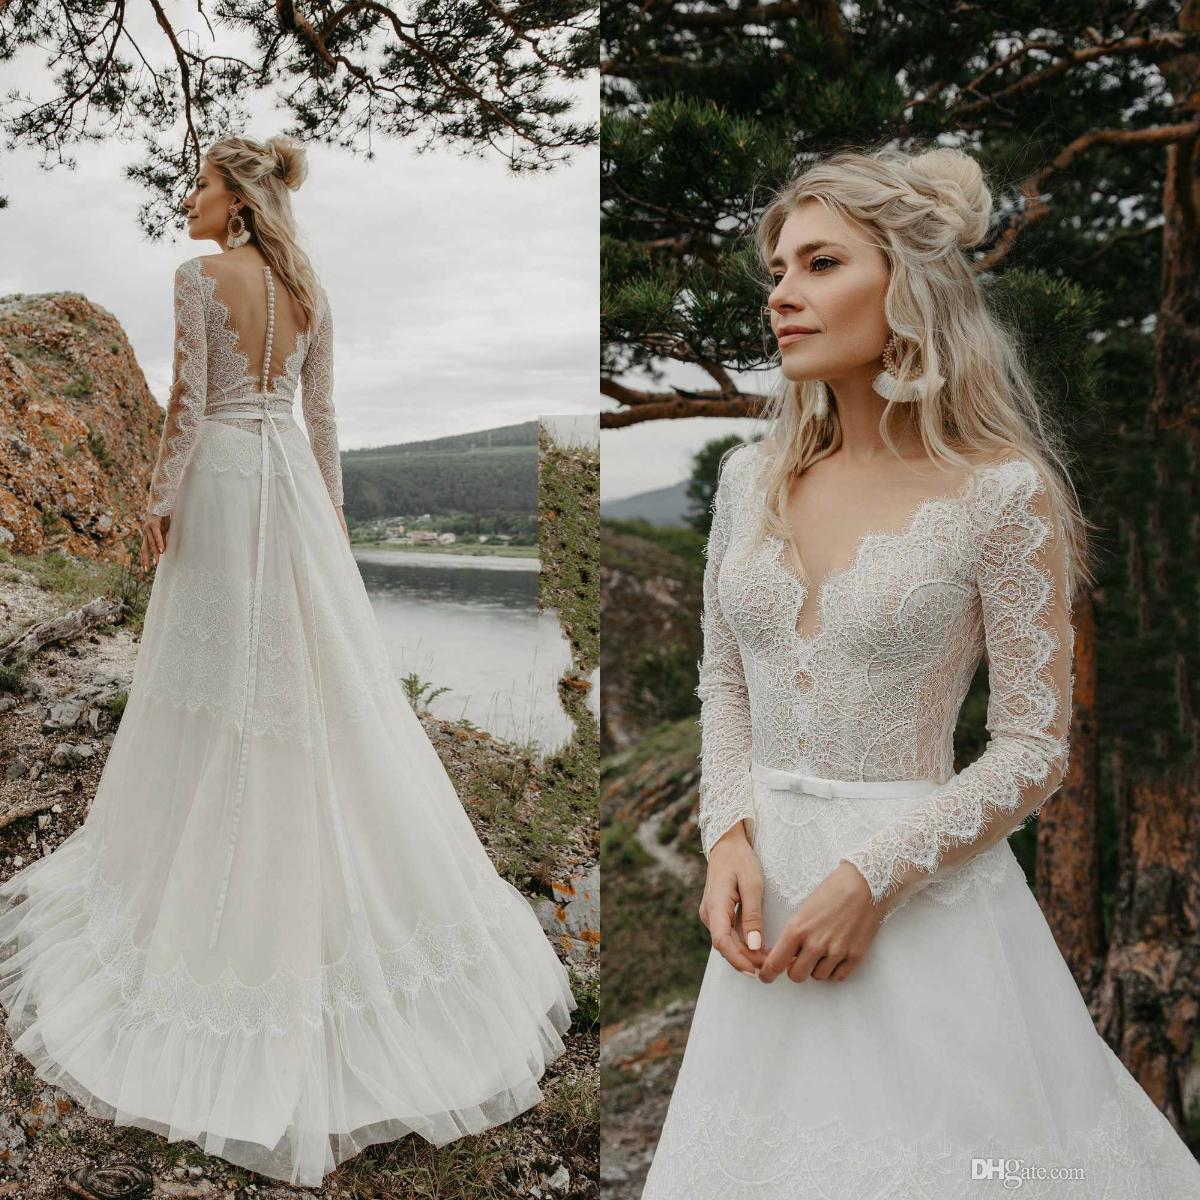 2020 Bohemian Wedding Dress Lace Appliqued Long Sleeve Sheer V Neck Bridal Gowns Plus Size Beach Boho Wedding Dresses